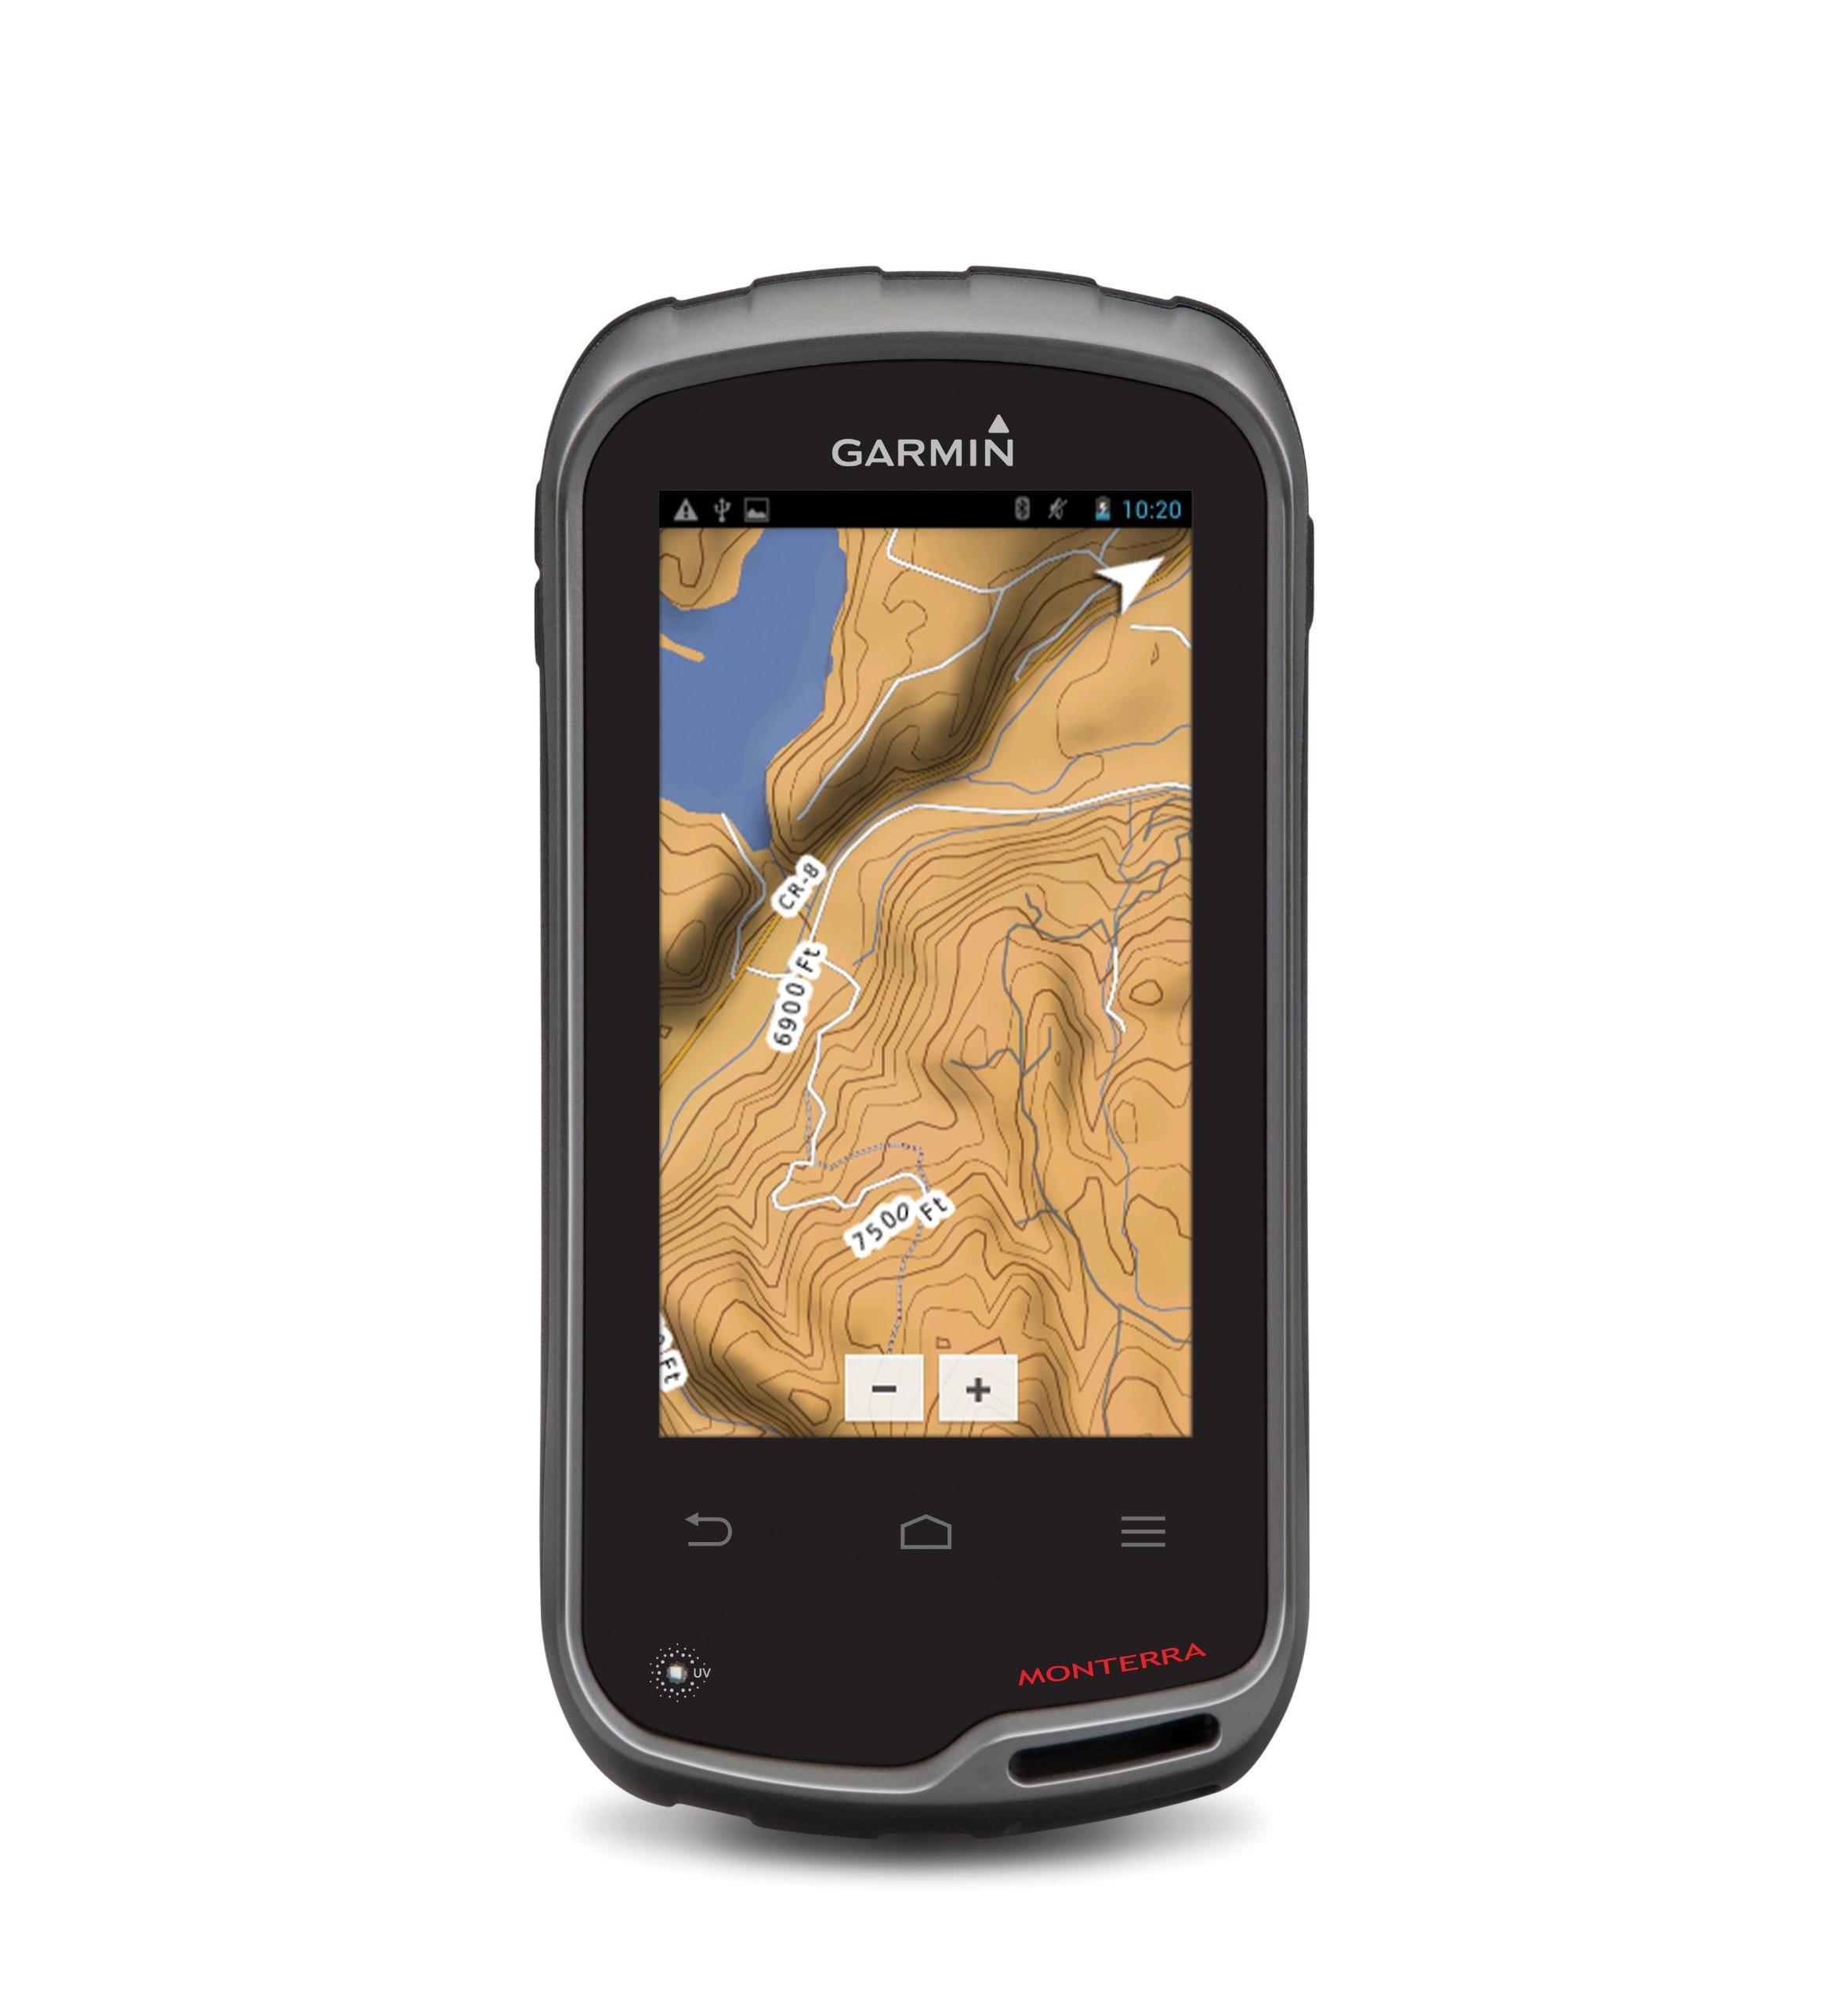 Garmin Monterra Wi-Fi Enabled GPS Navigator 010-01065-00 (4'' Display, 8MP Camera, GPS, Google Play Apps,3D MapMerge) by Garmin